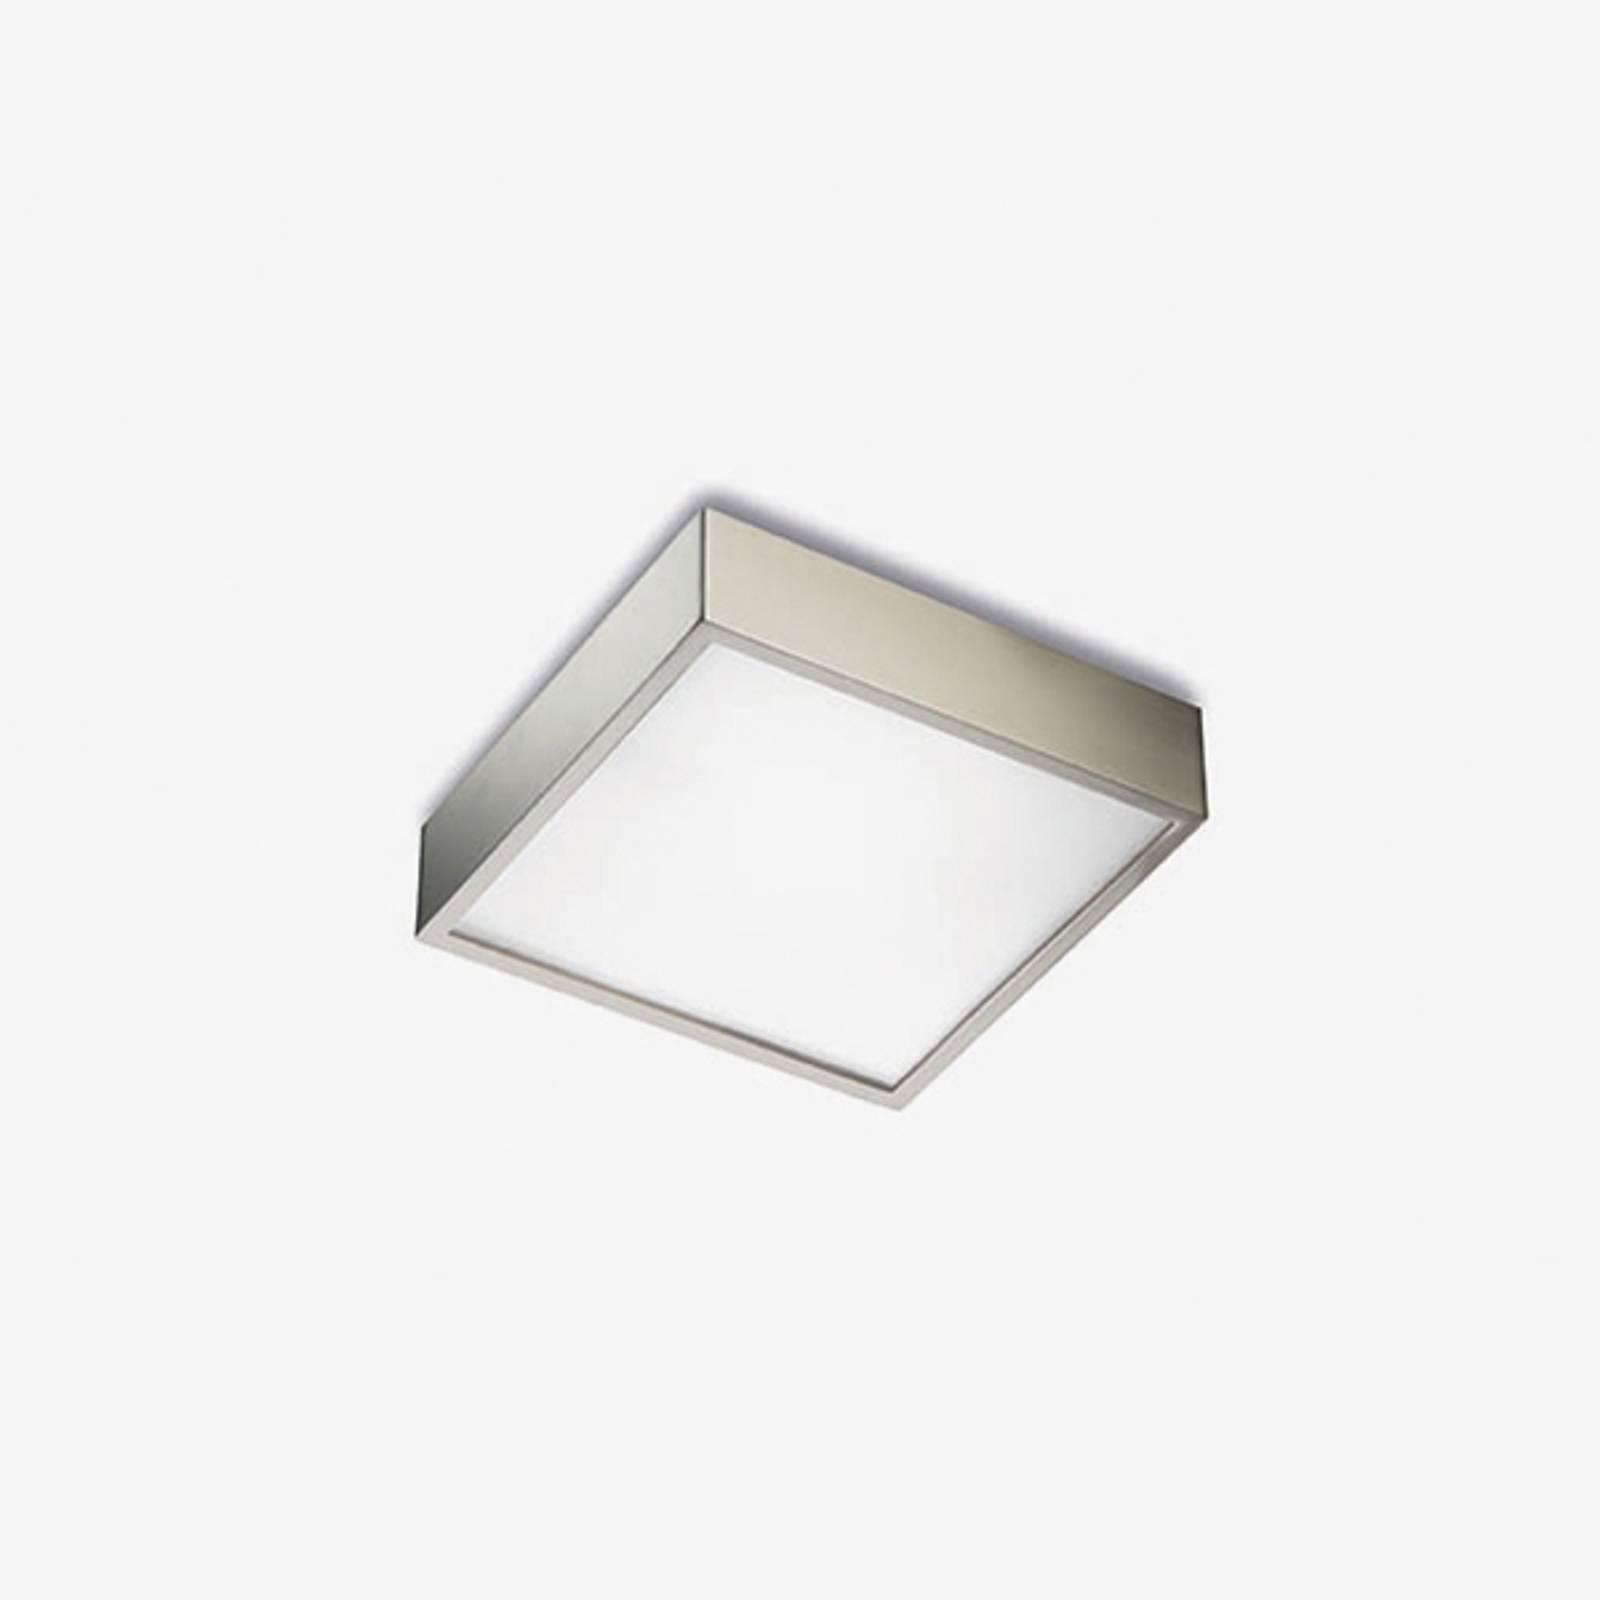 Lampa sufitowa APOLO, IP44, 20 cm, chrom